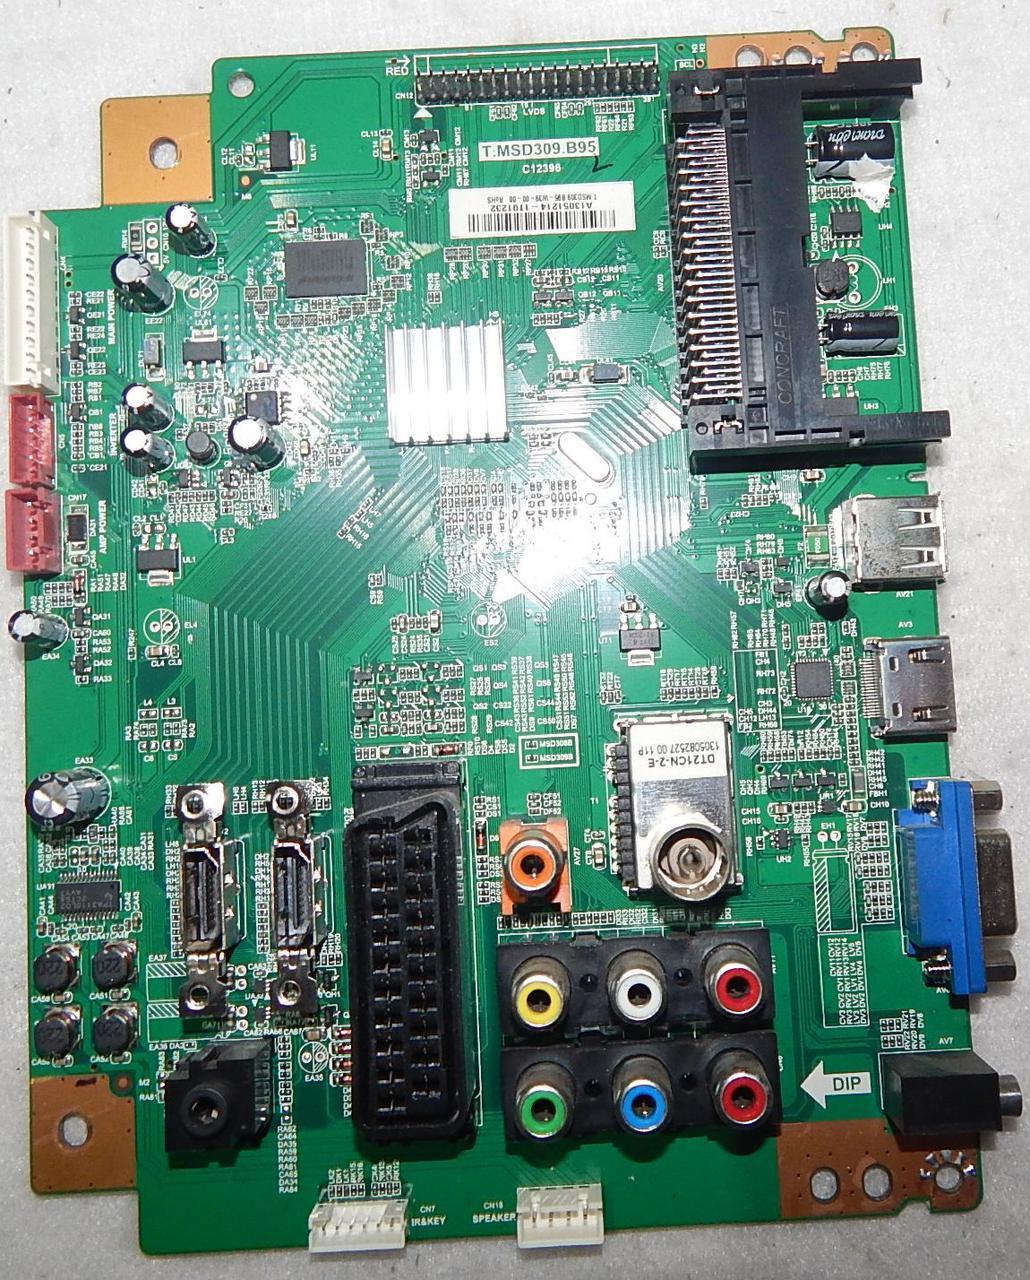 Материнская плата T.MSD309.B95 для телевизора FUNAI 39FL753P/10